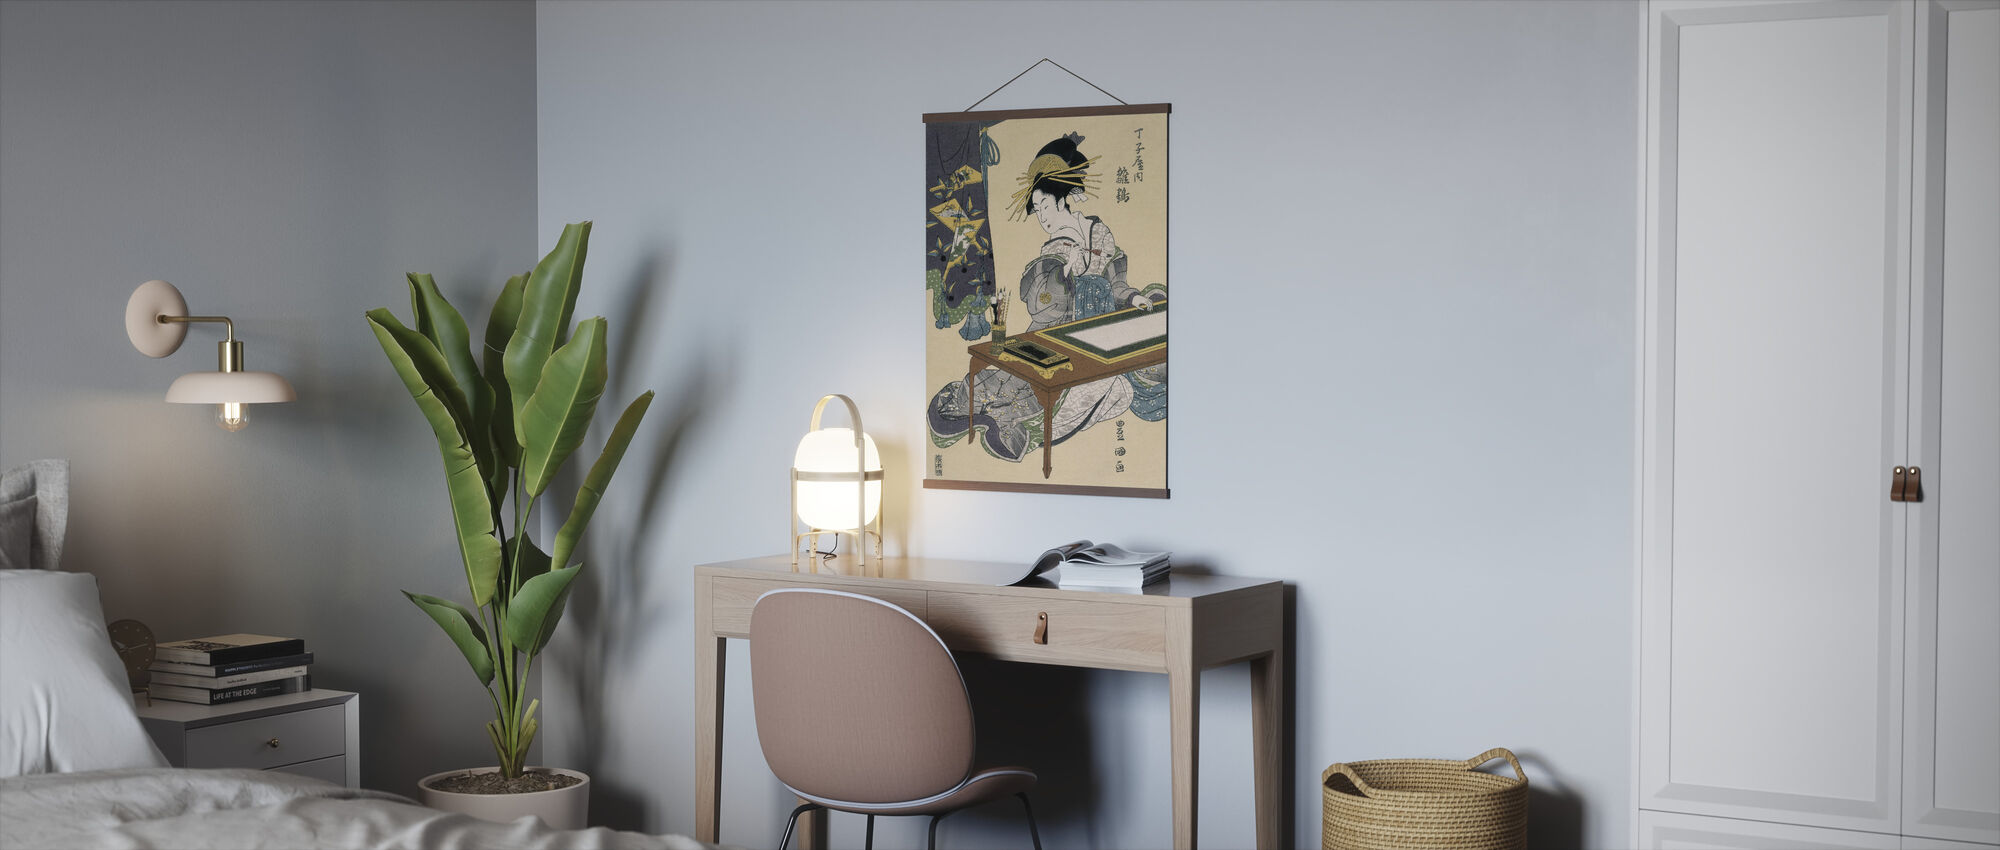 Cortesana Hinazuru - Utagawa Toyokuni - Poster - Kontor